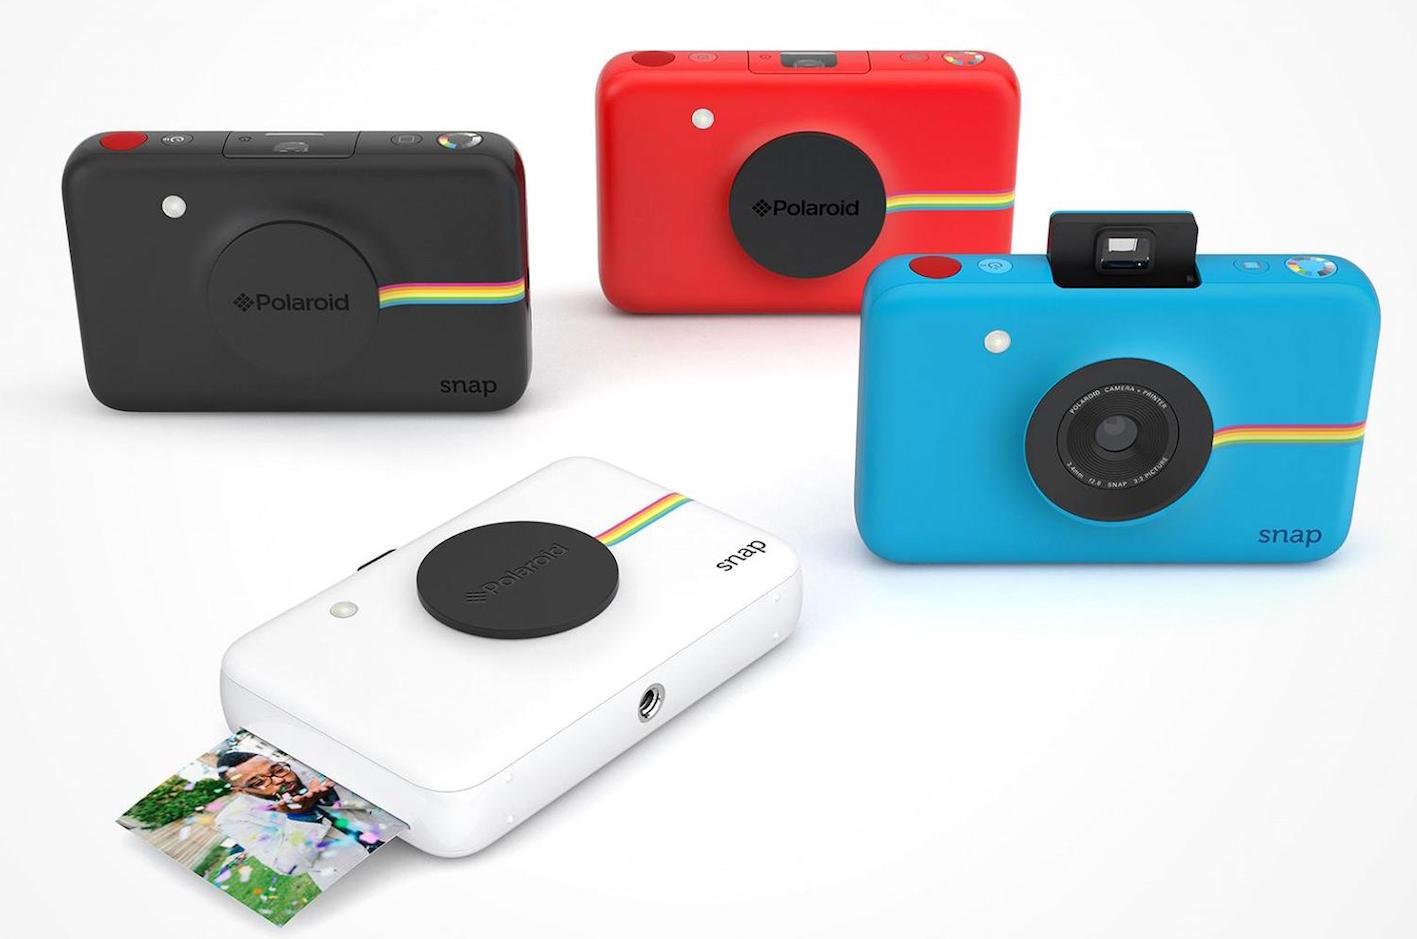 Polaroid фотоаппараты в 2016 году - 8